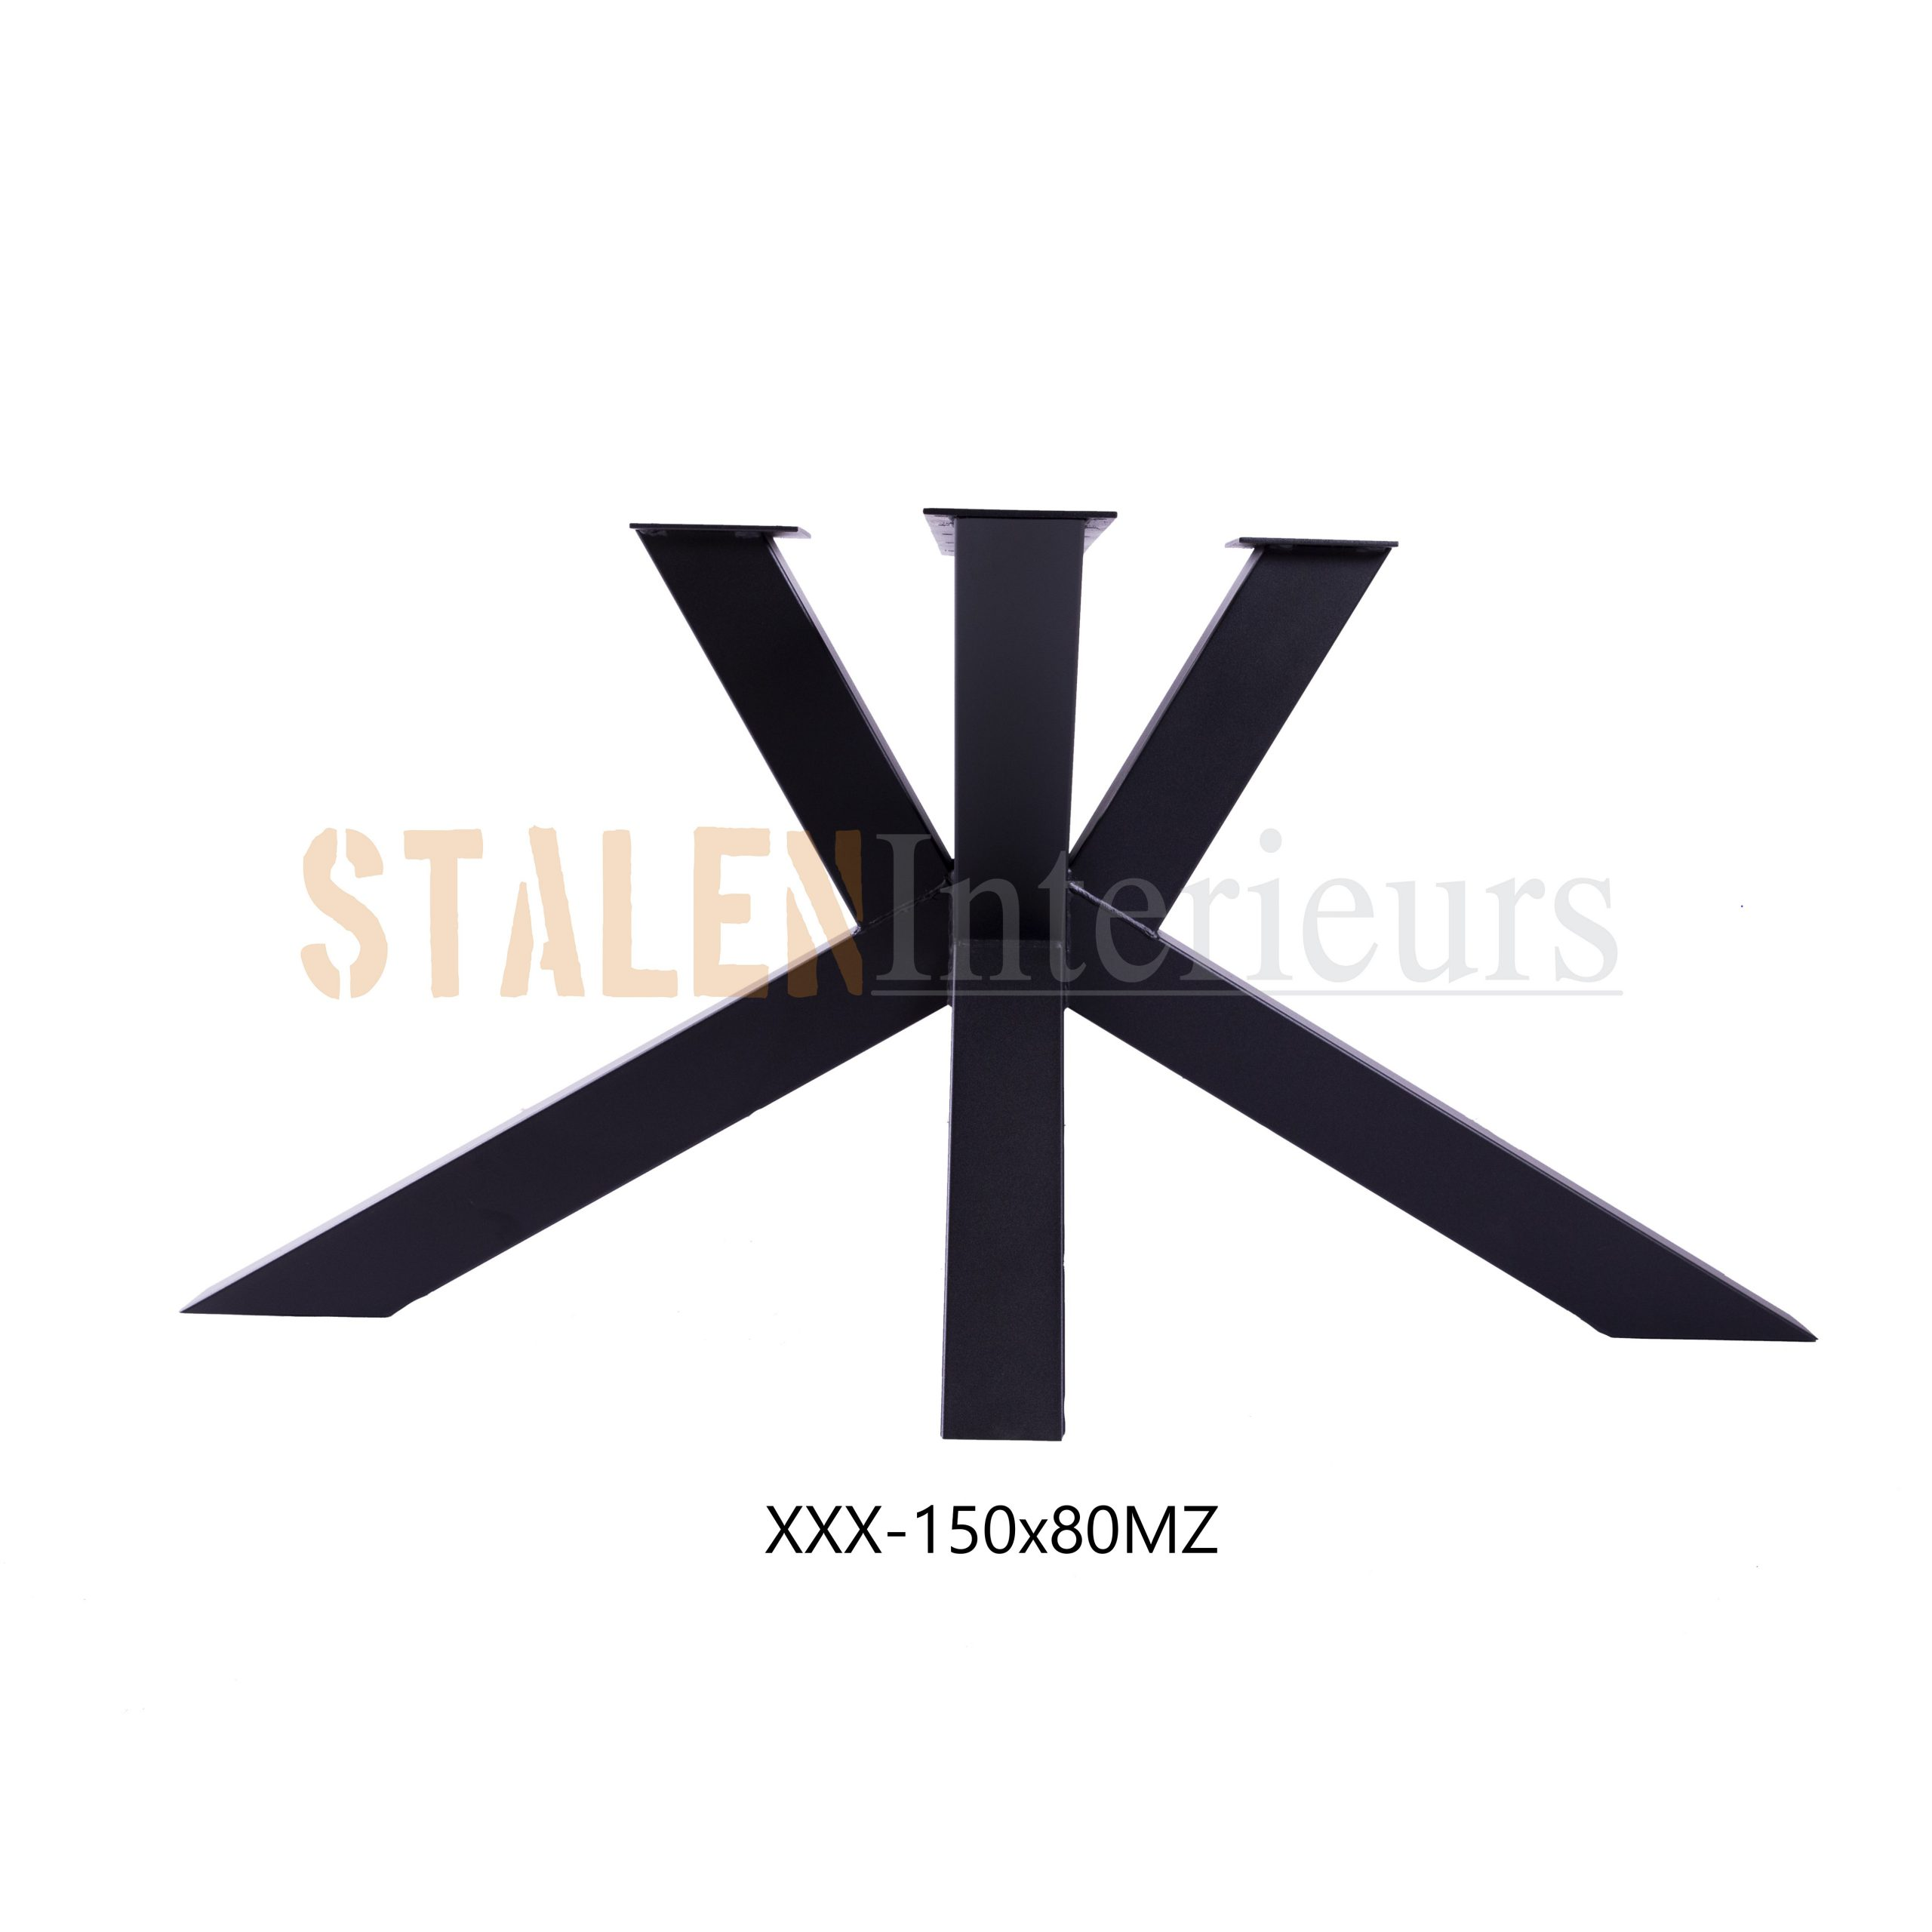 XXX150x80MZ